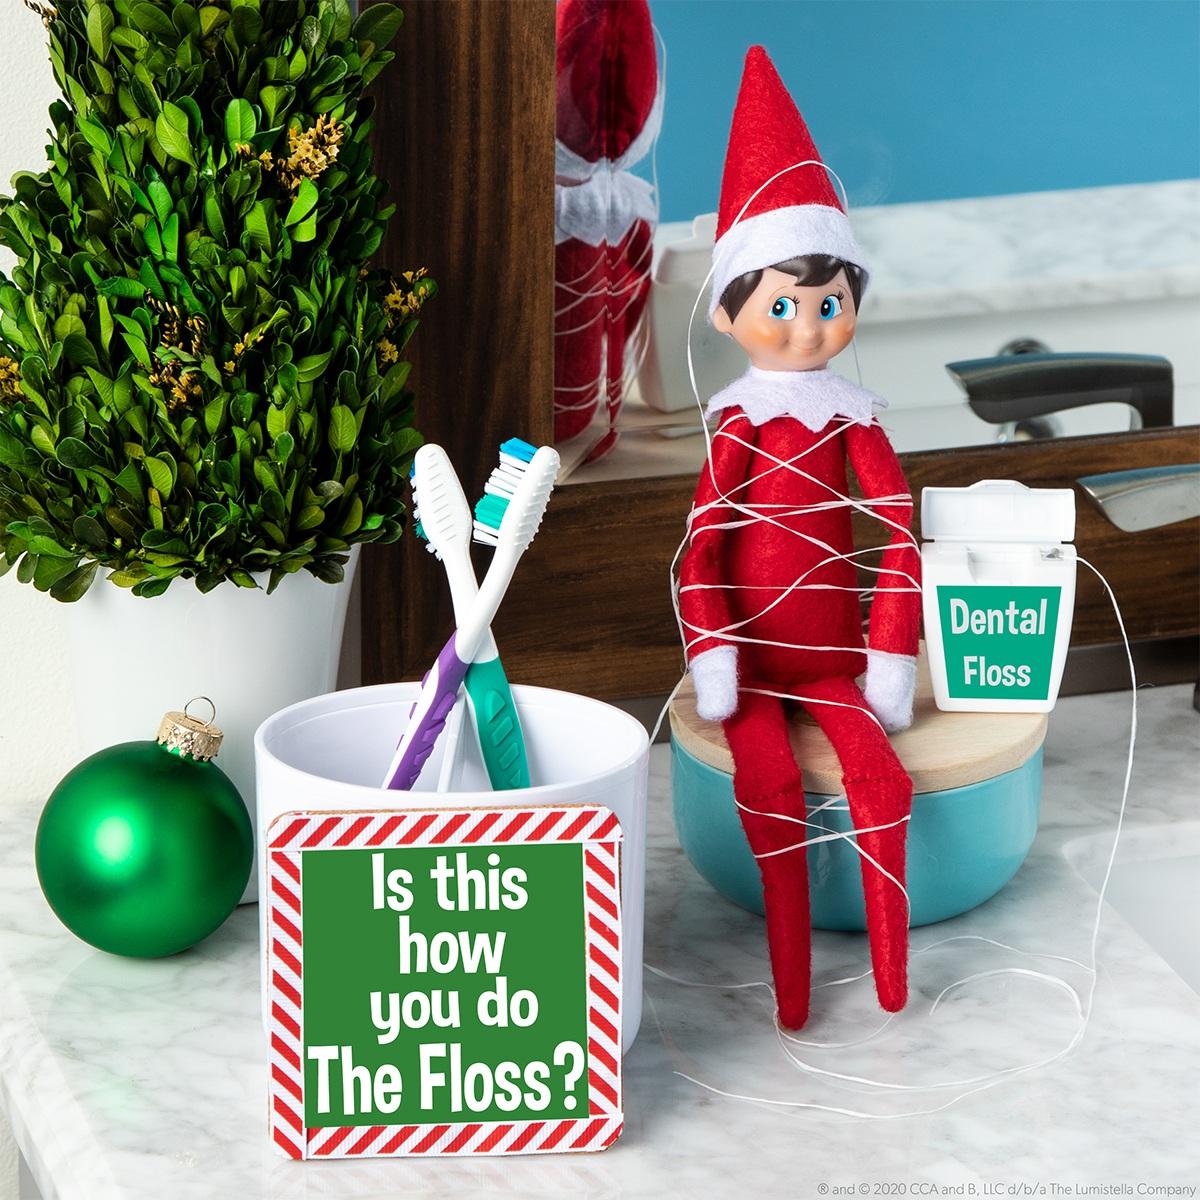 Elf tied up in floss